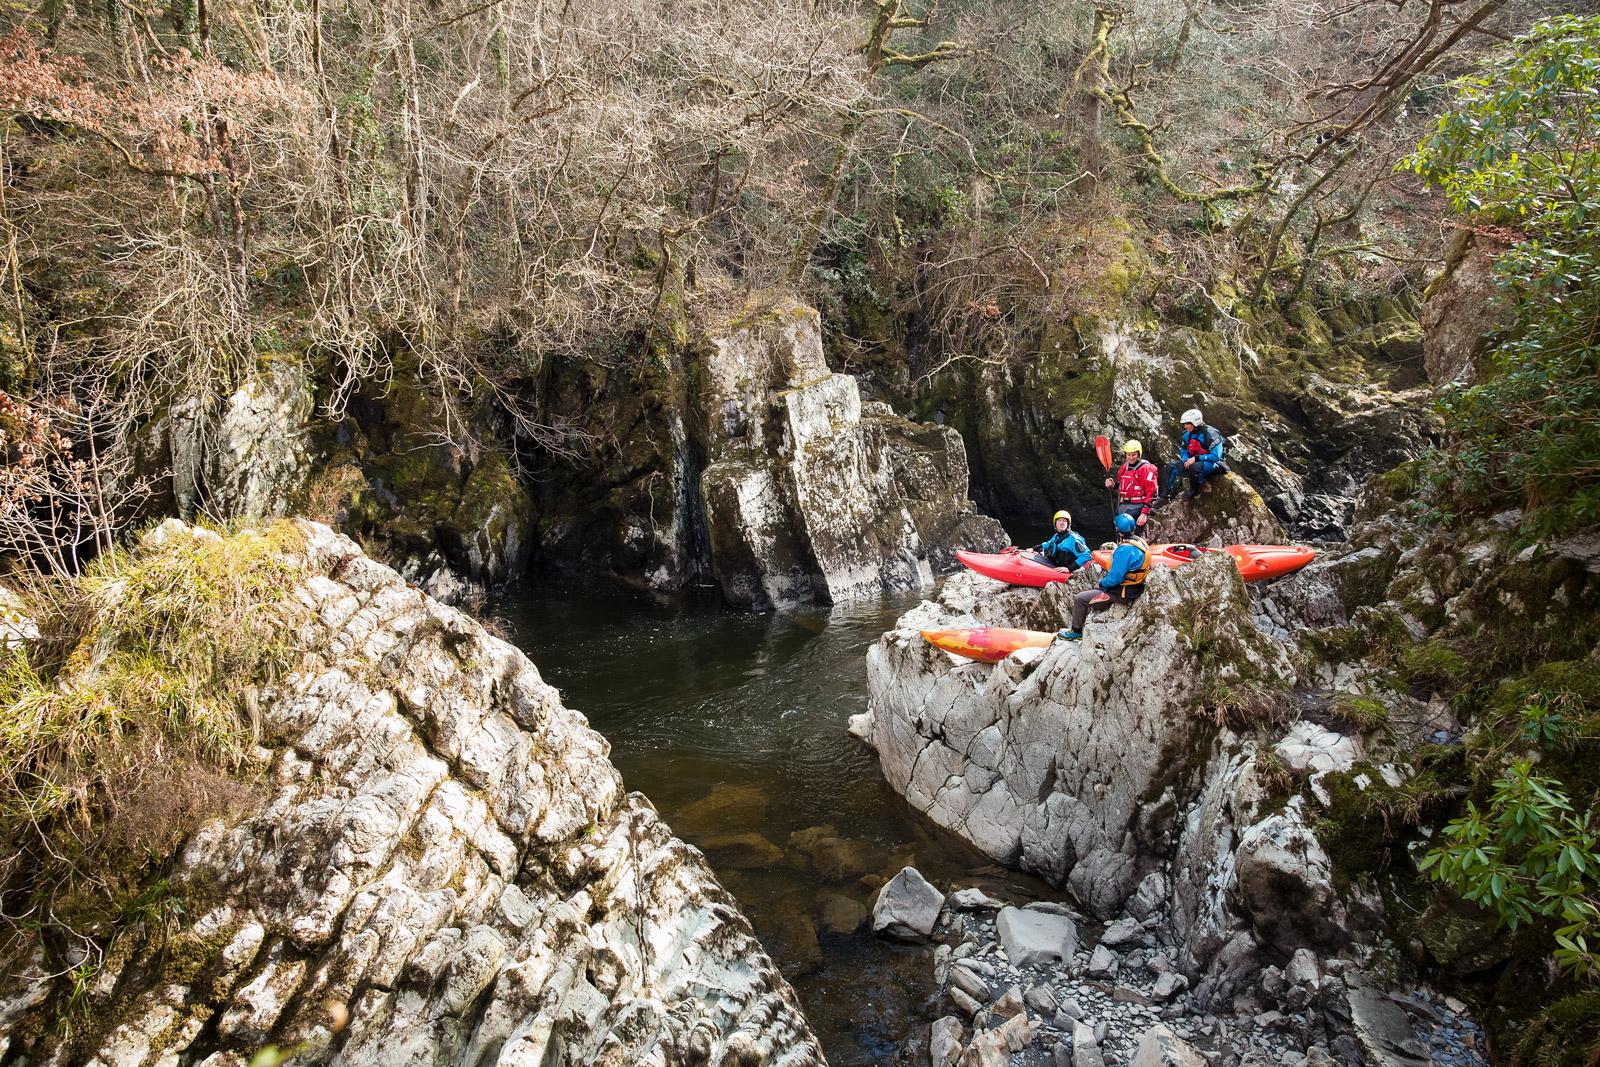 Kayakers-Chilling.jpg